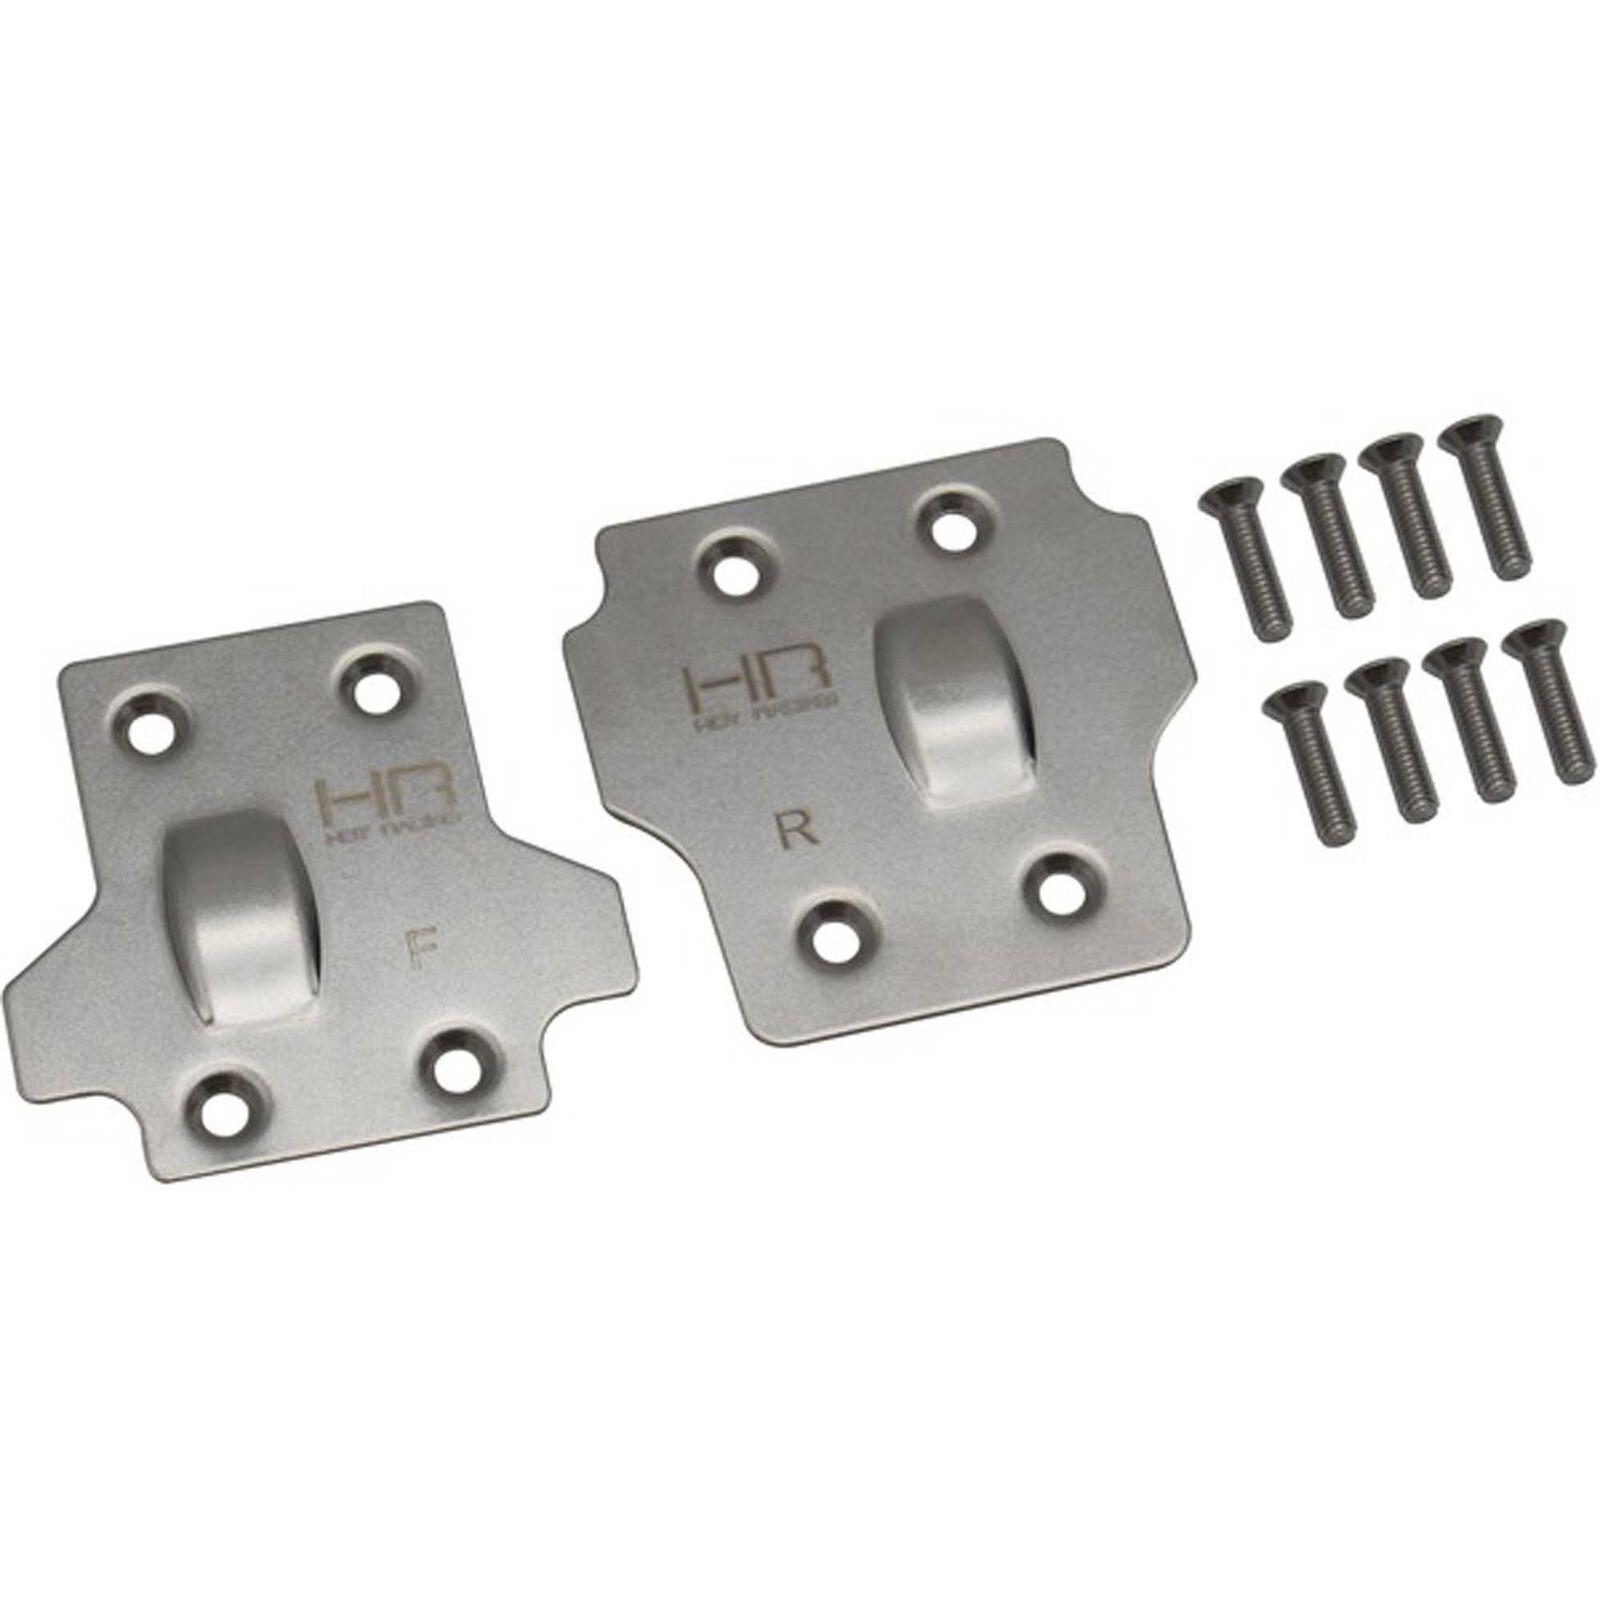 Stainless Steel Skid Plate Set: ARRMA 1/8 BLX